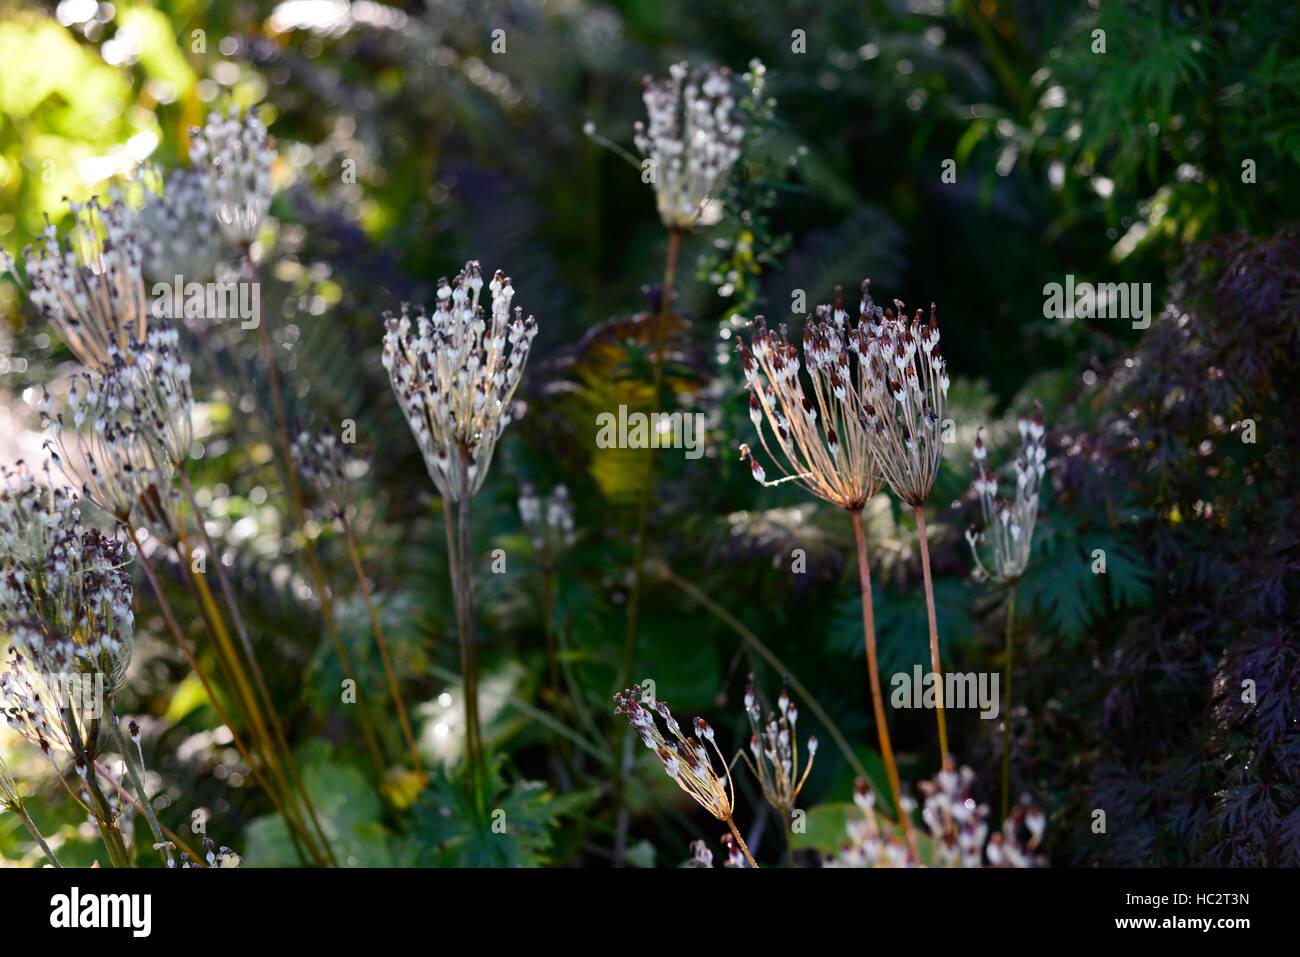 primula florindae, seedhead seedheads japanese primrose primroses seeds fertile garden RM Floral - Stock Image